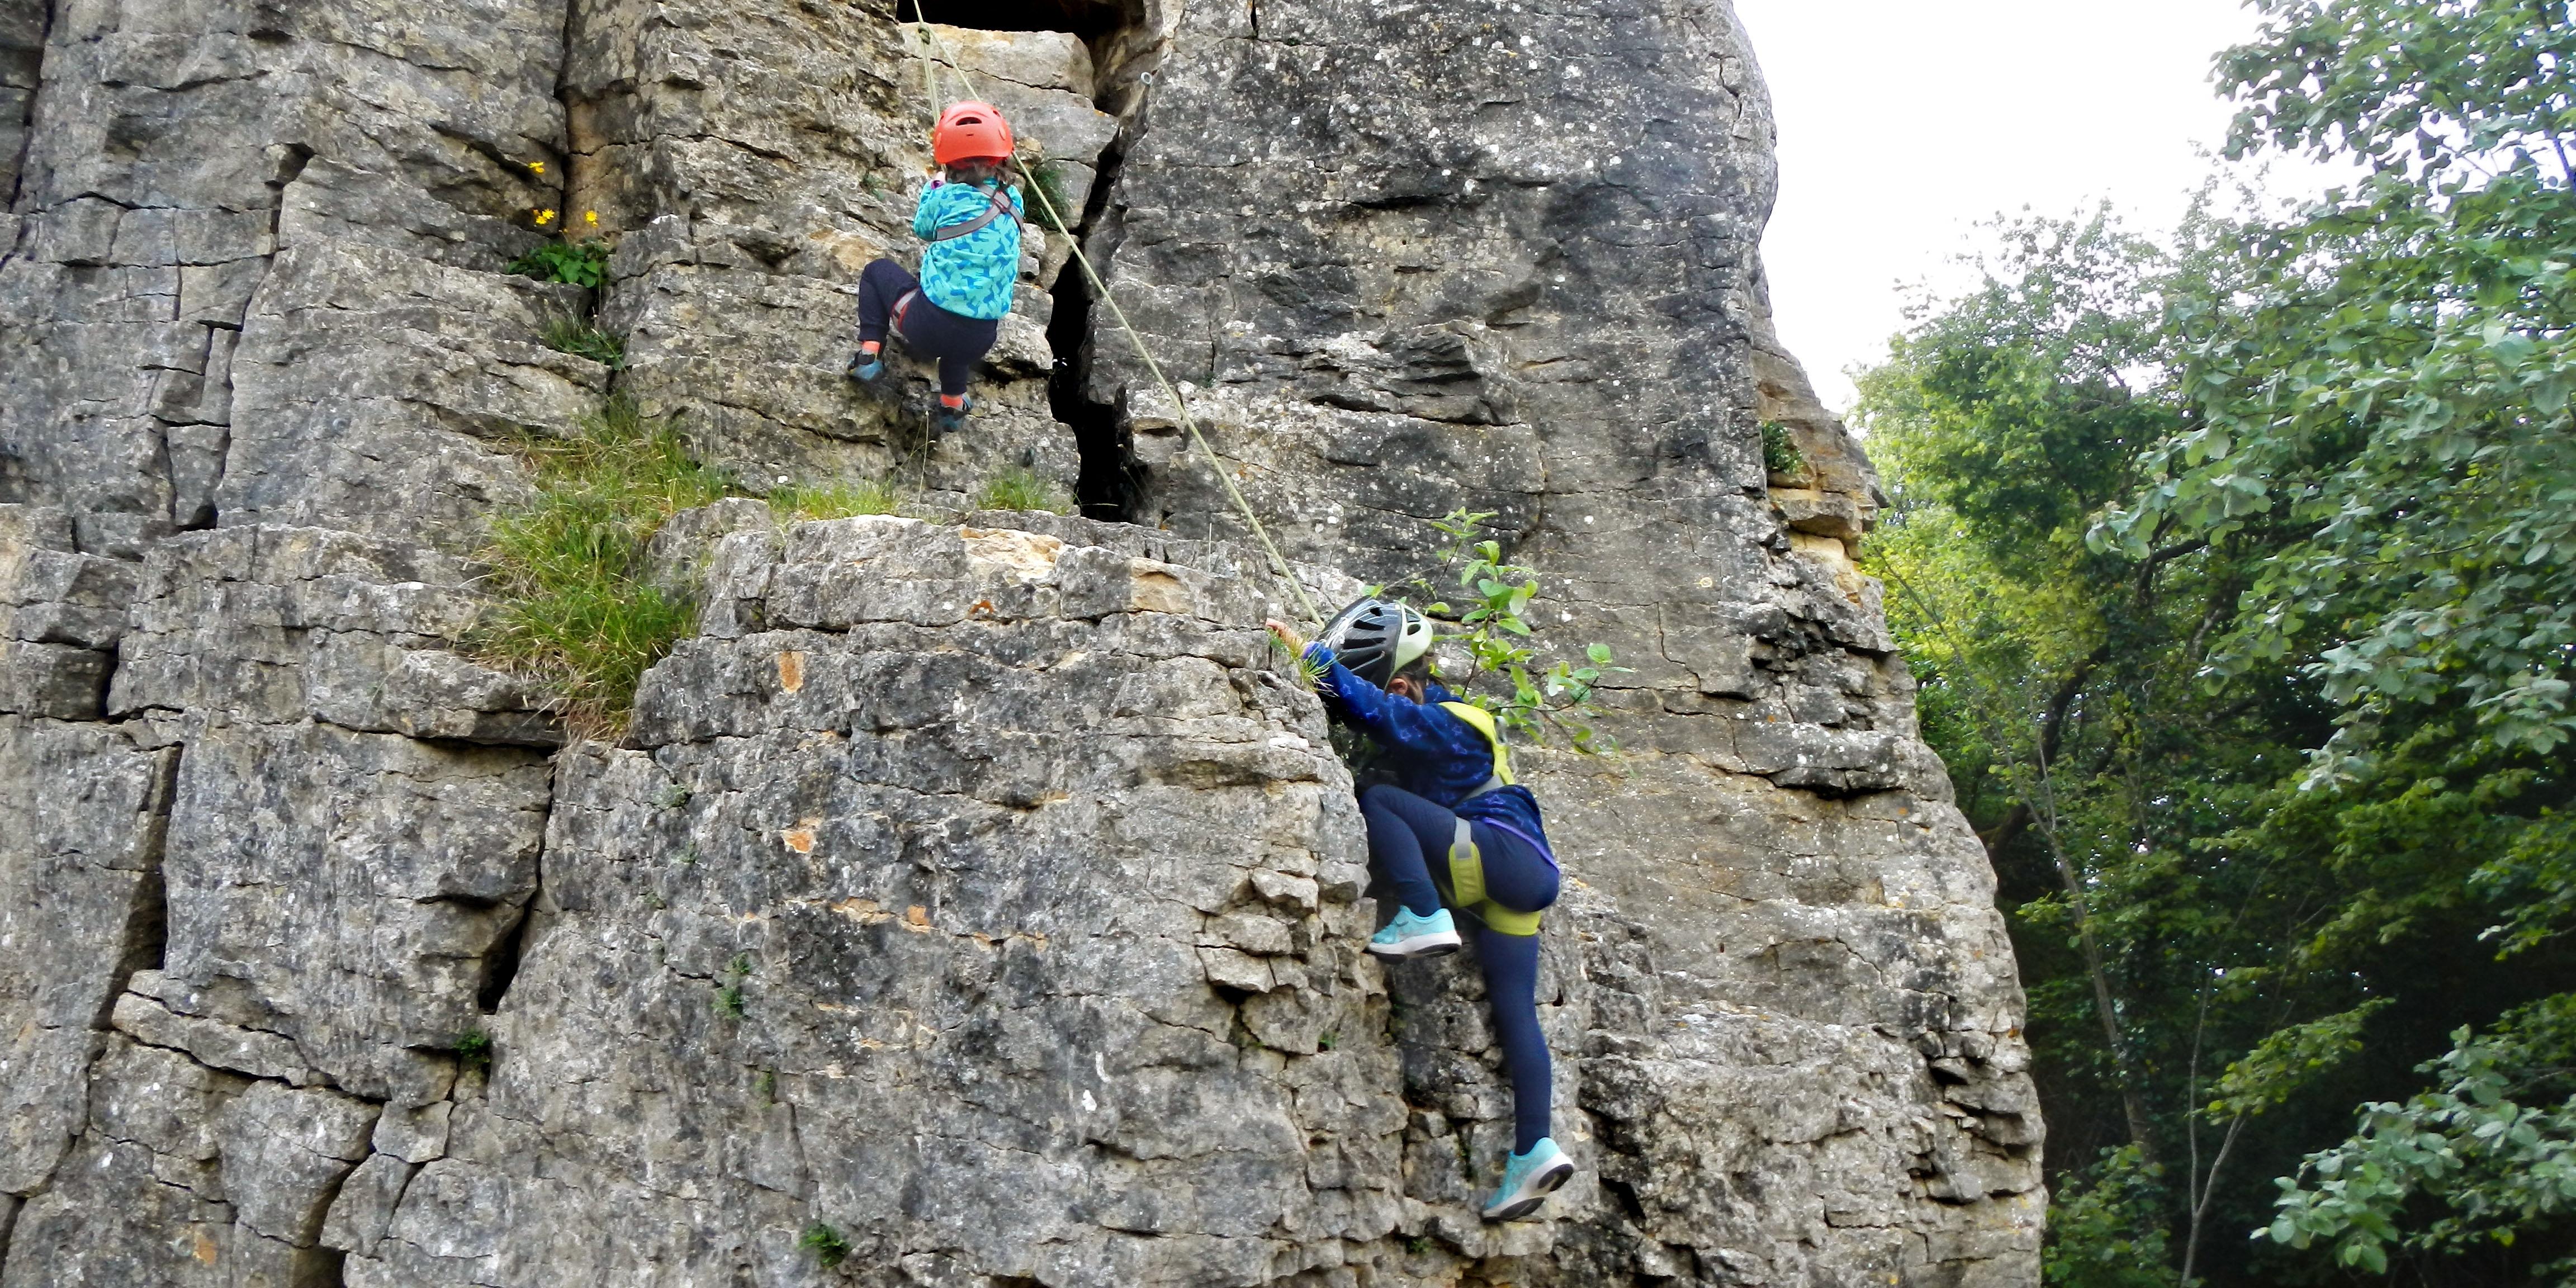 Kinder klettern am Seil auf dem Felsen